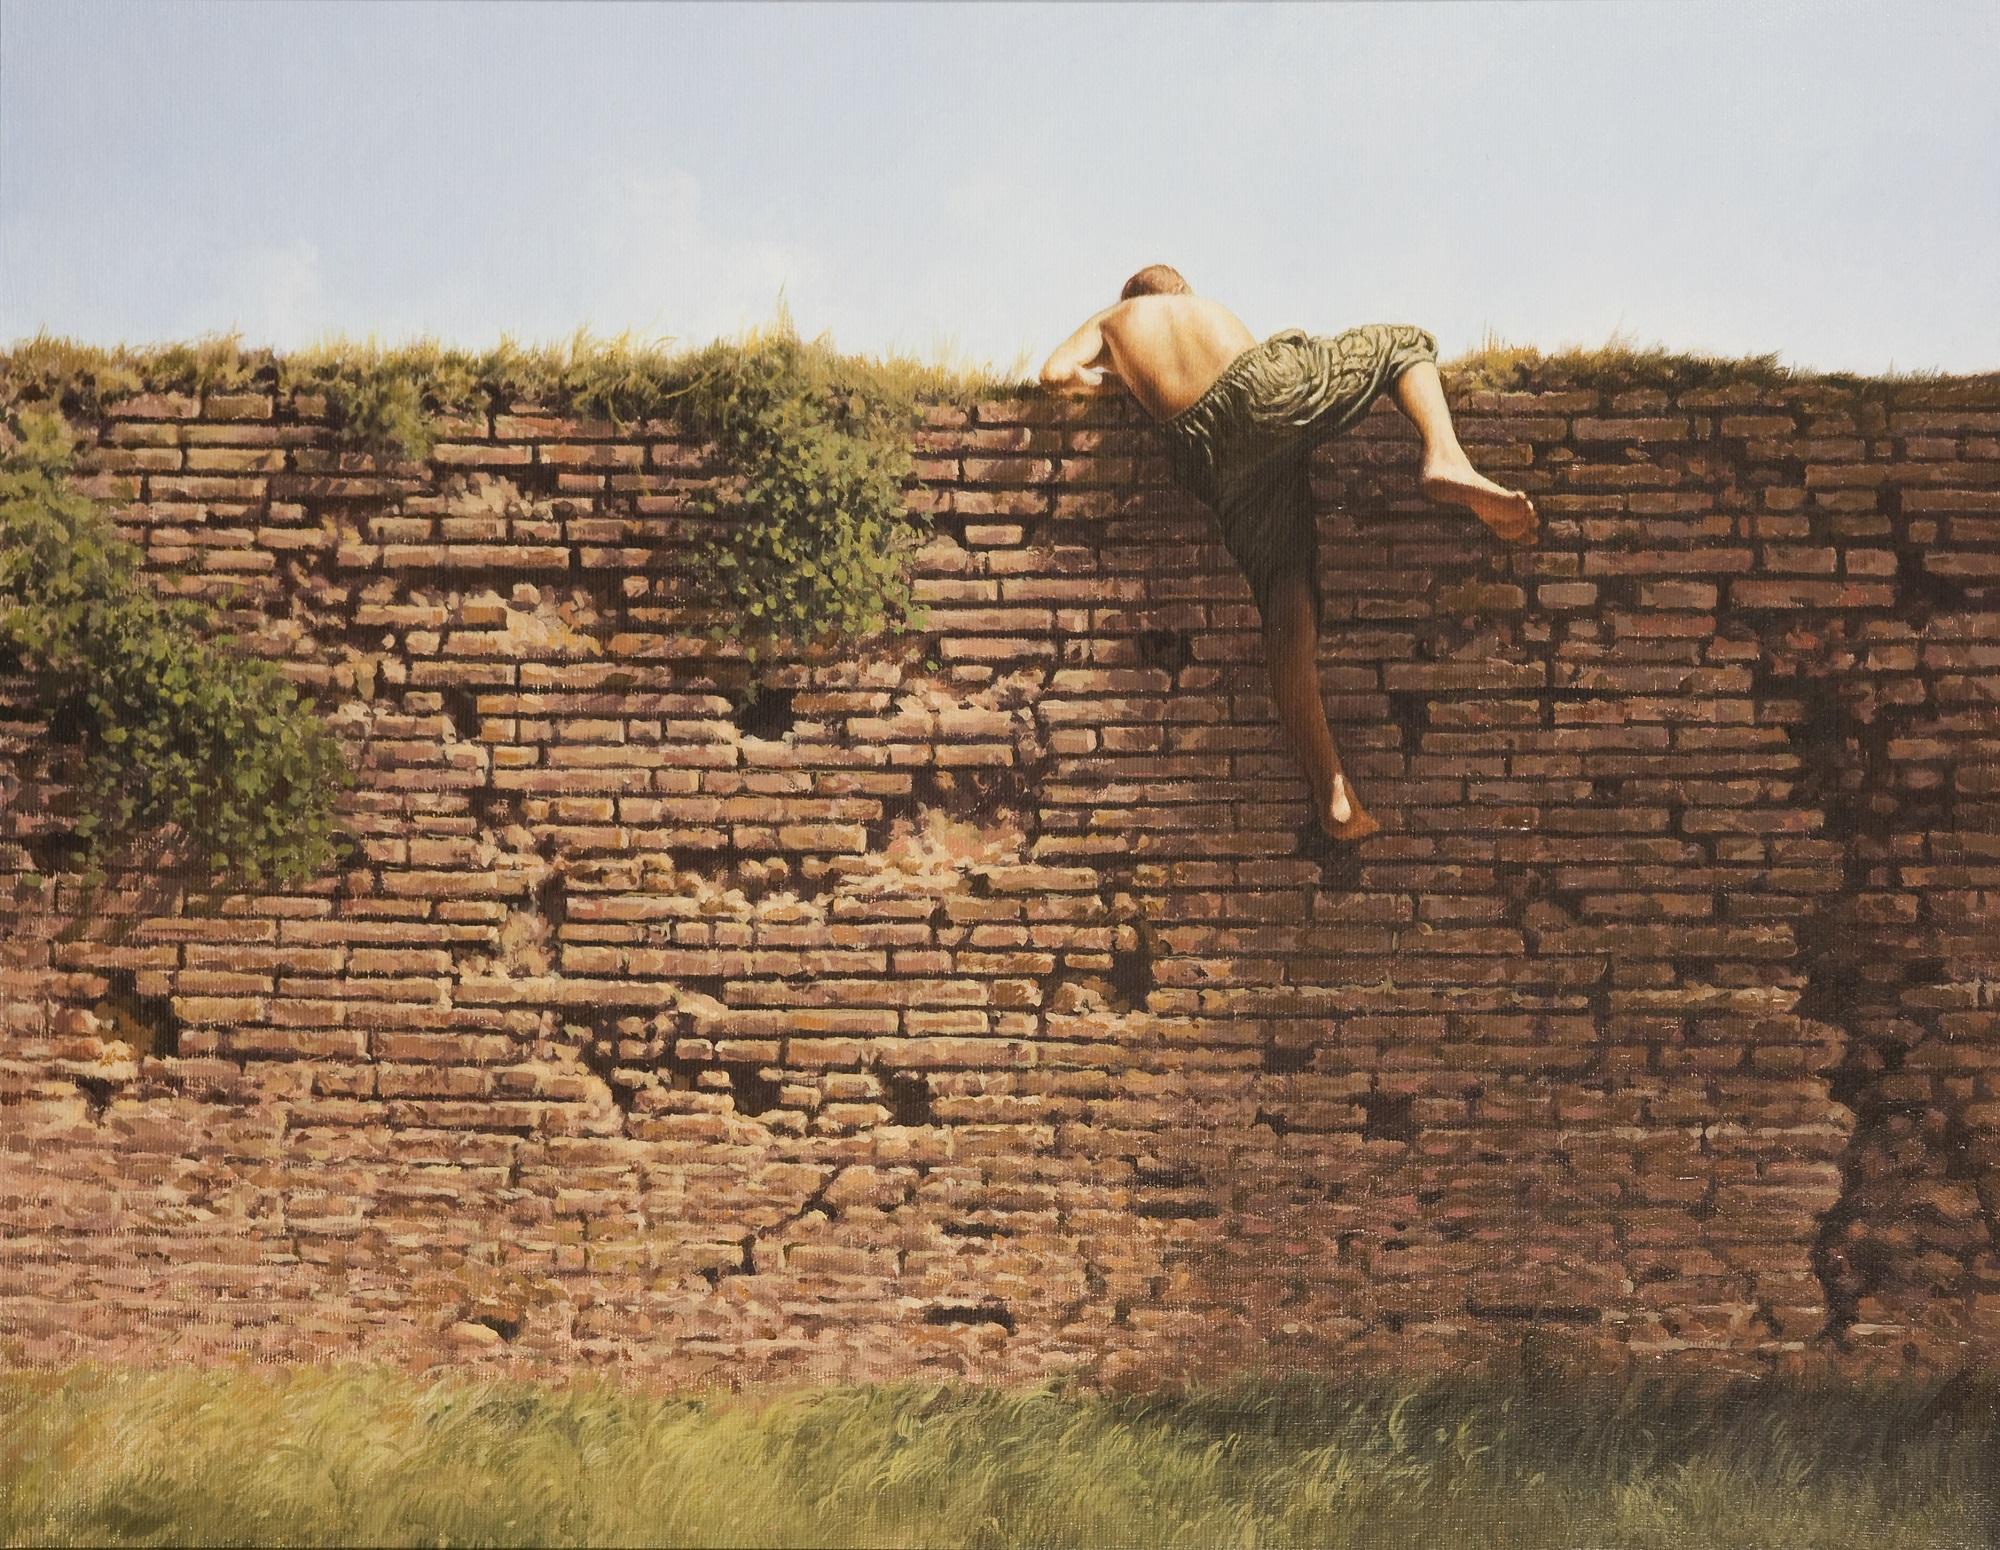 'The Wall' Agim Sulaj Oil on canvas, 40cm x 55cm